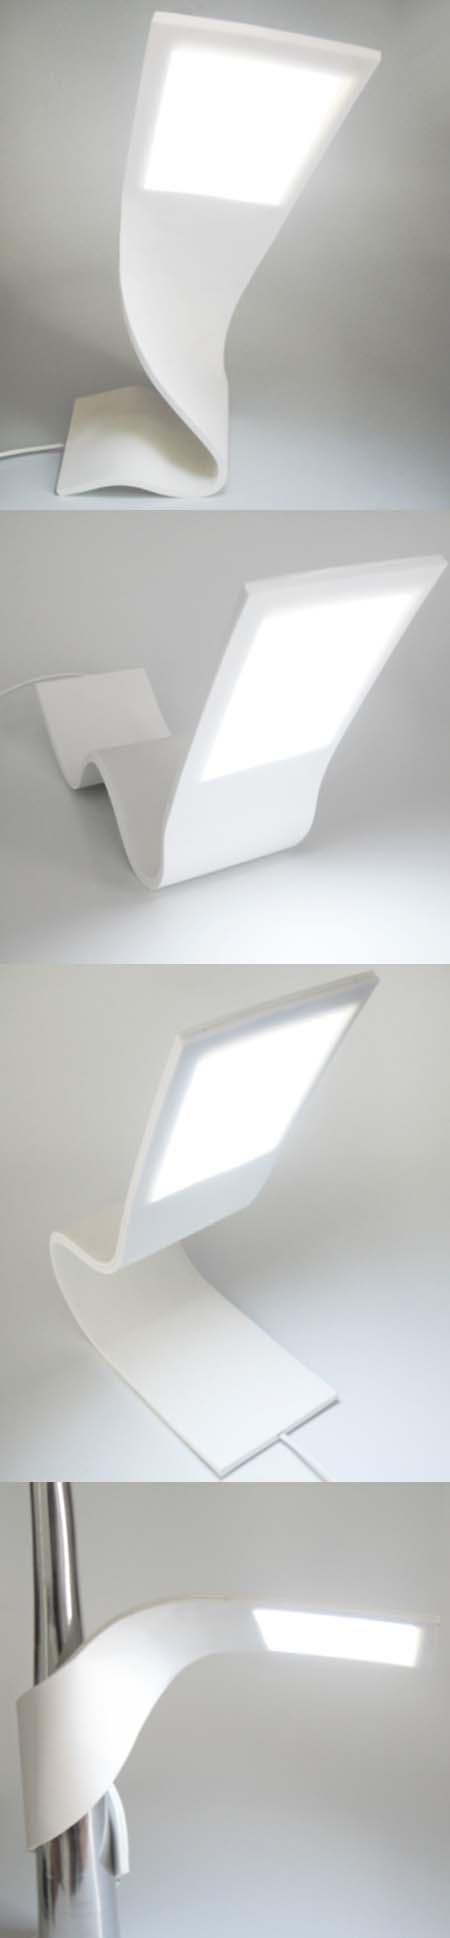 lampada iLamp